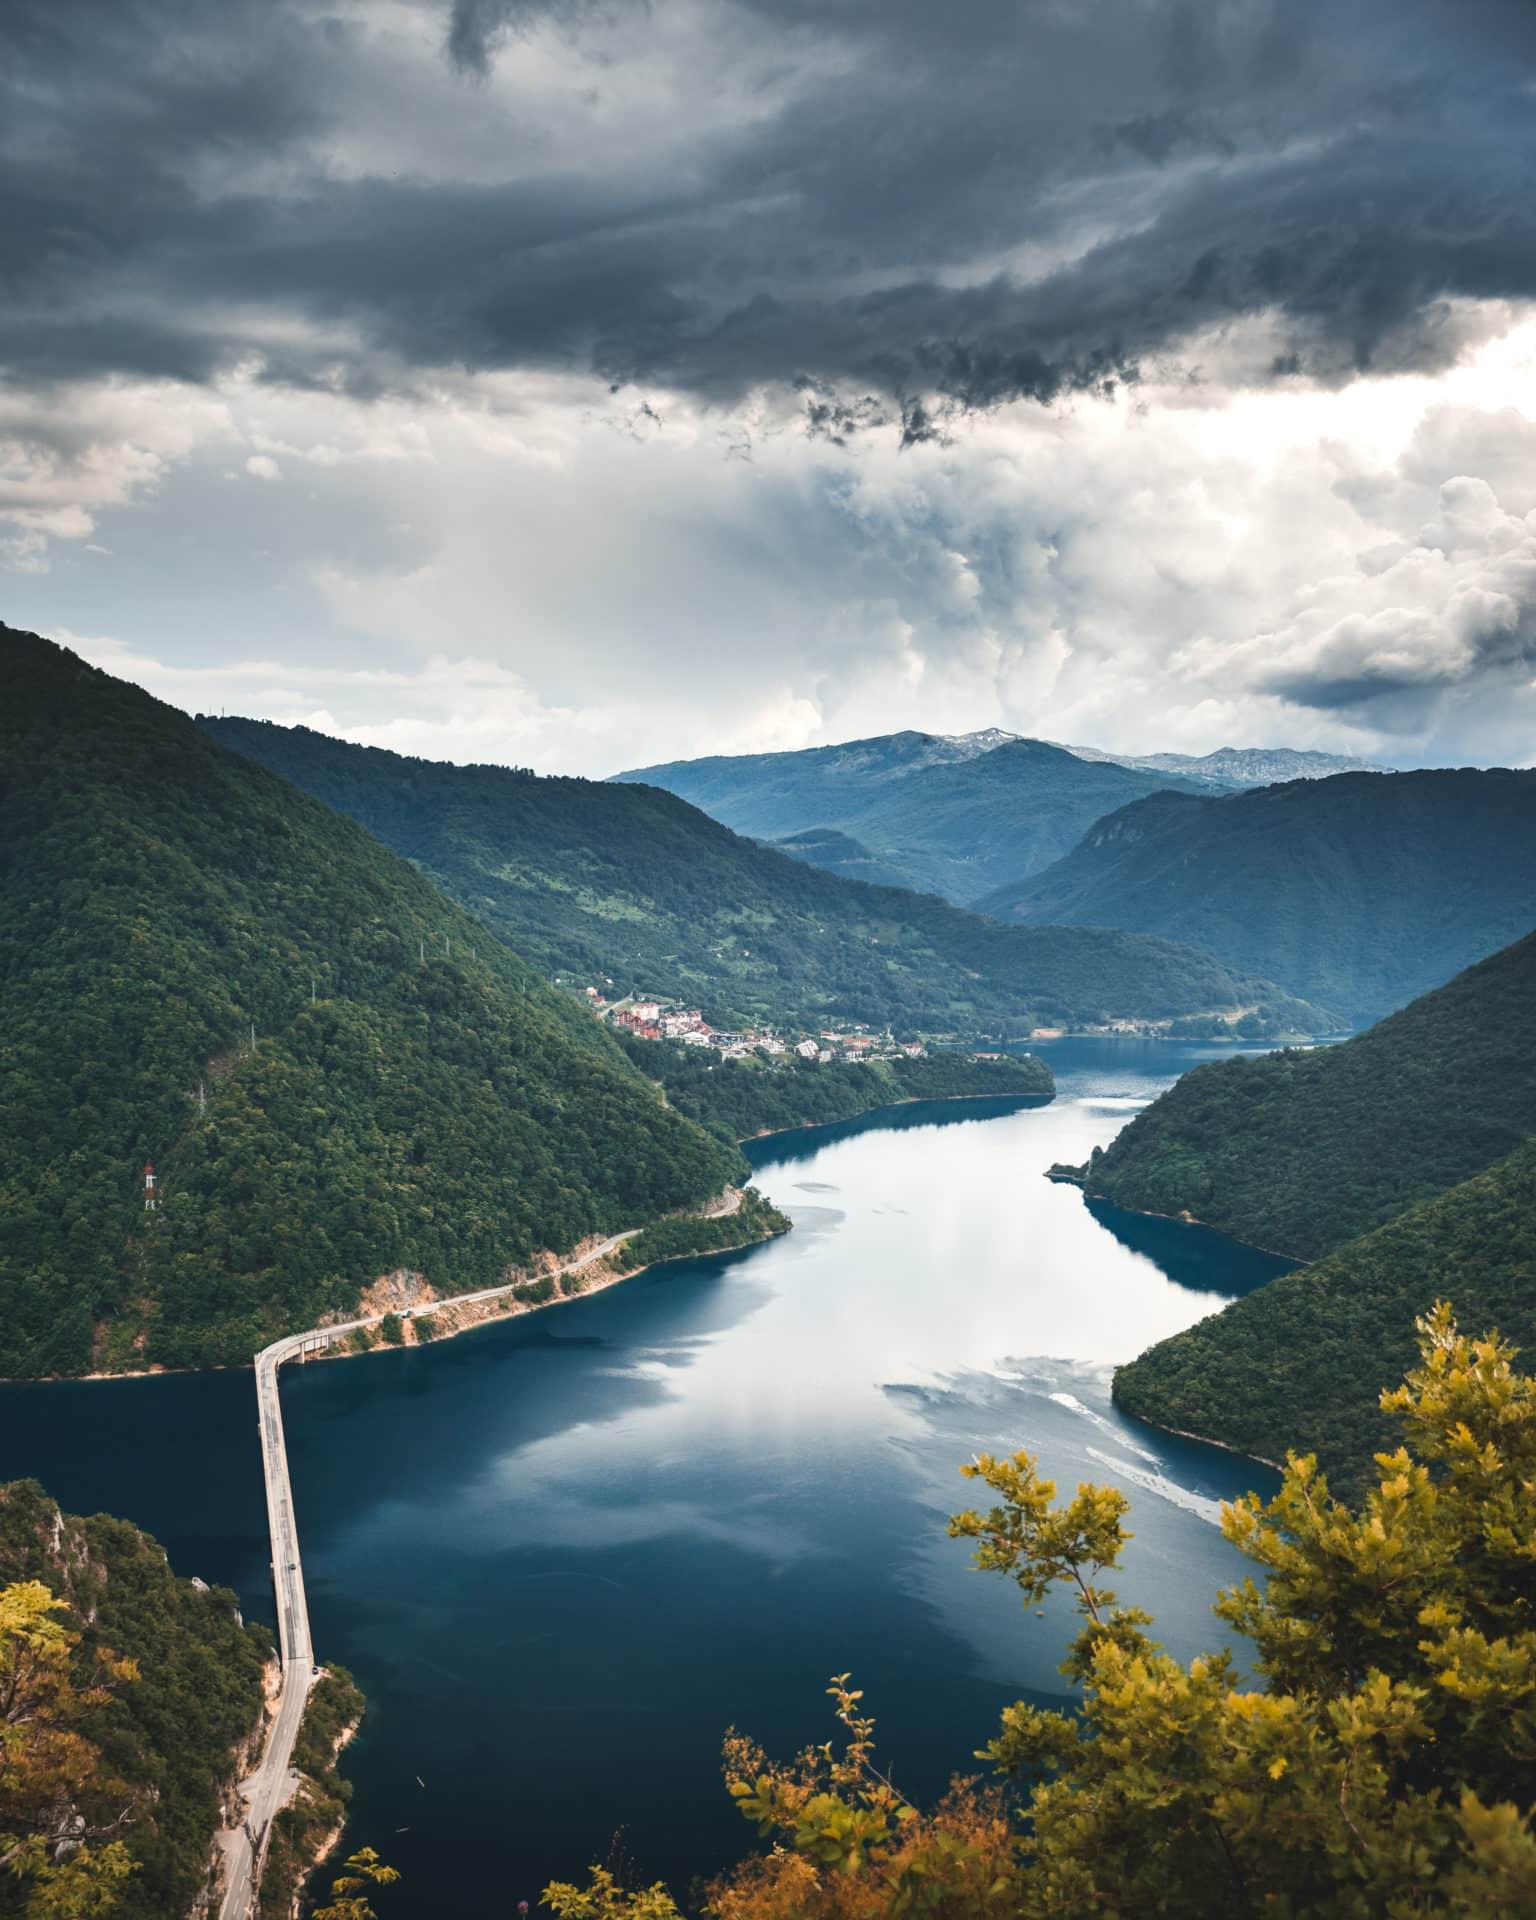 Pivso Jezero Montenegro Gewitter